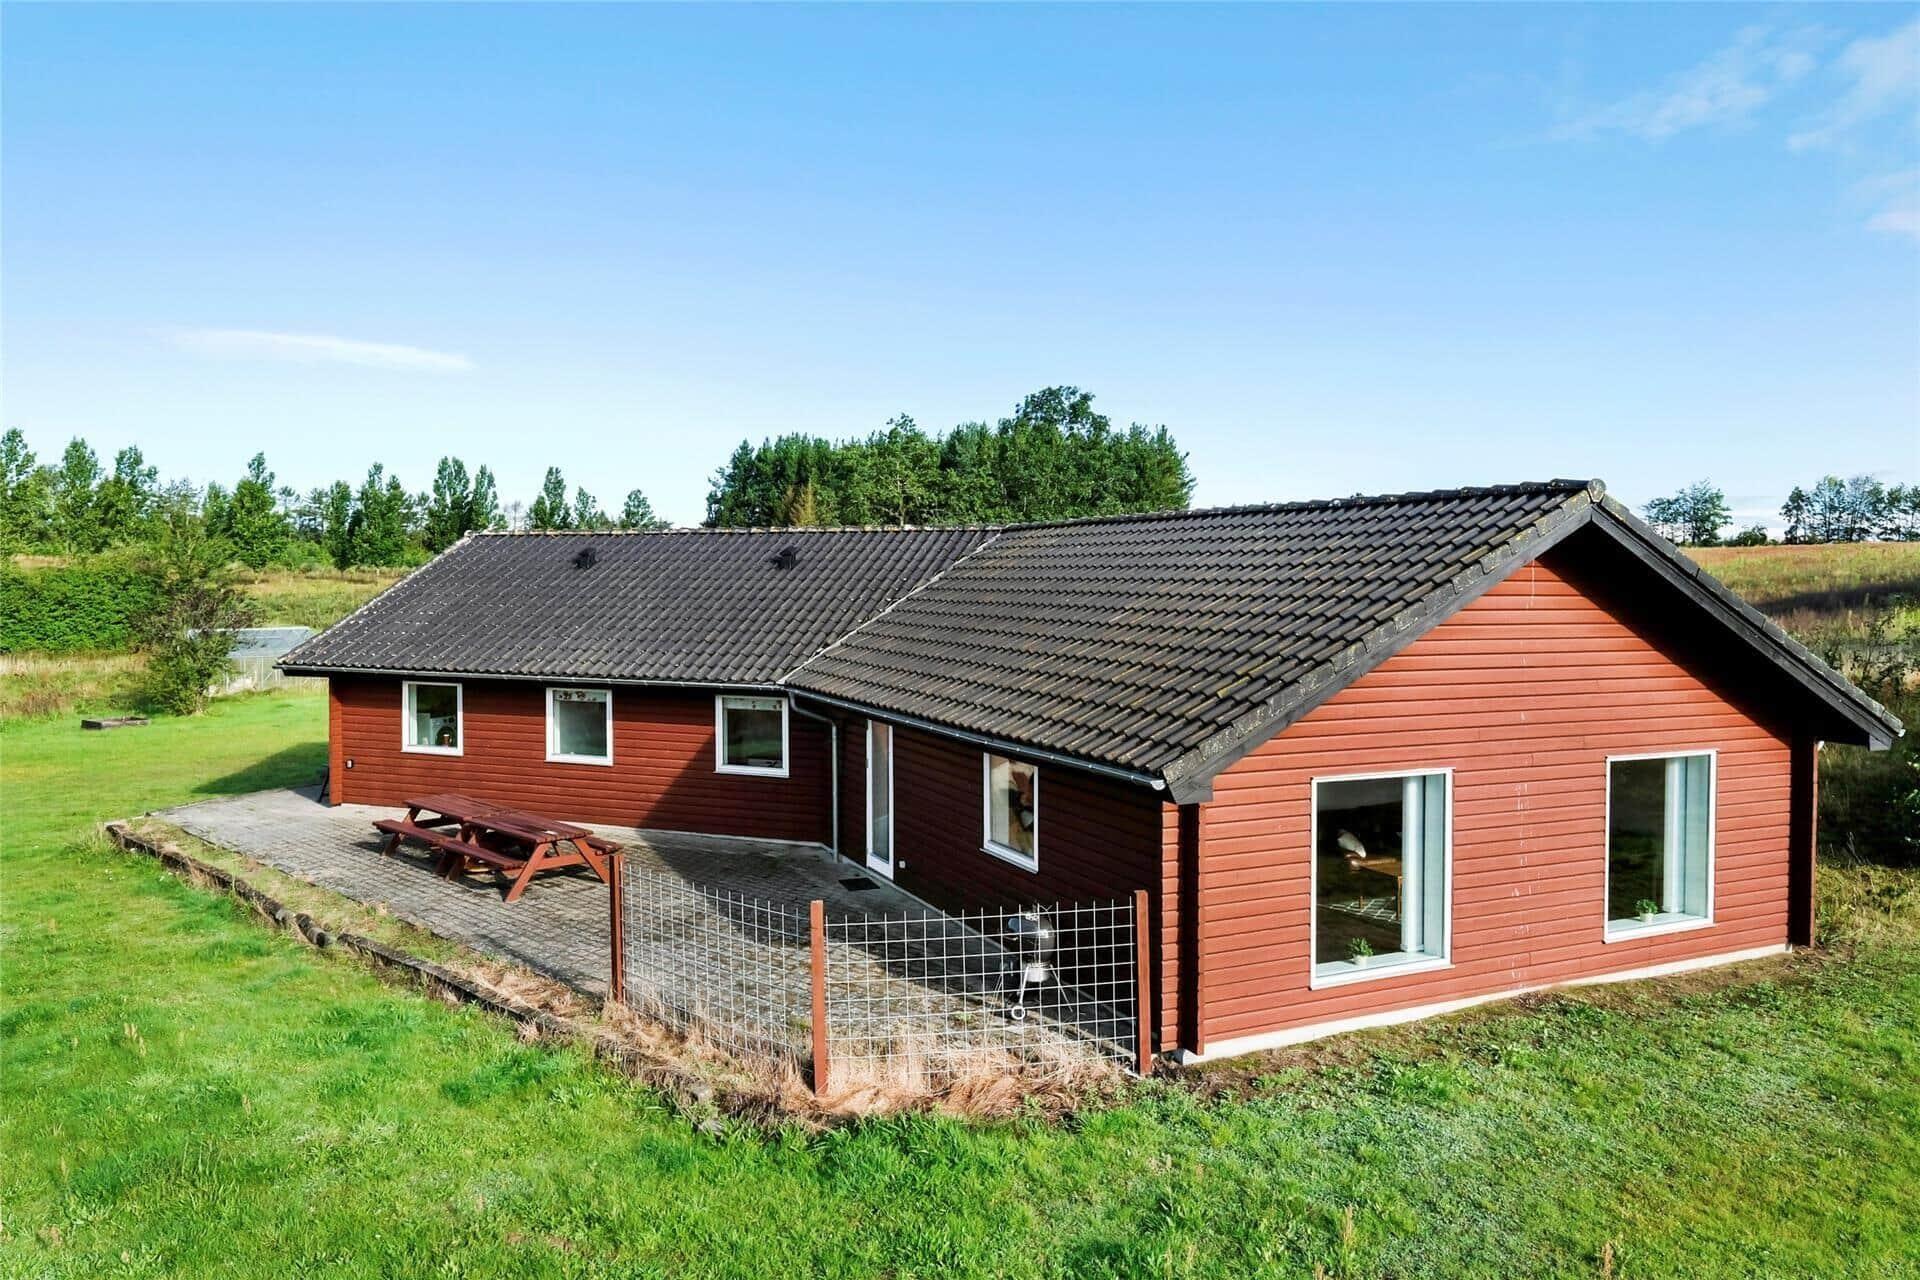 Billede 1-401 Sommerhus OH234, Glerupvej 55, DK - 9560 Hadsund